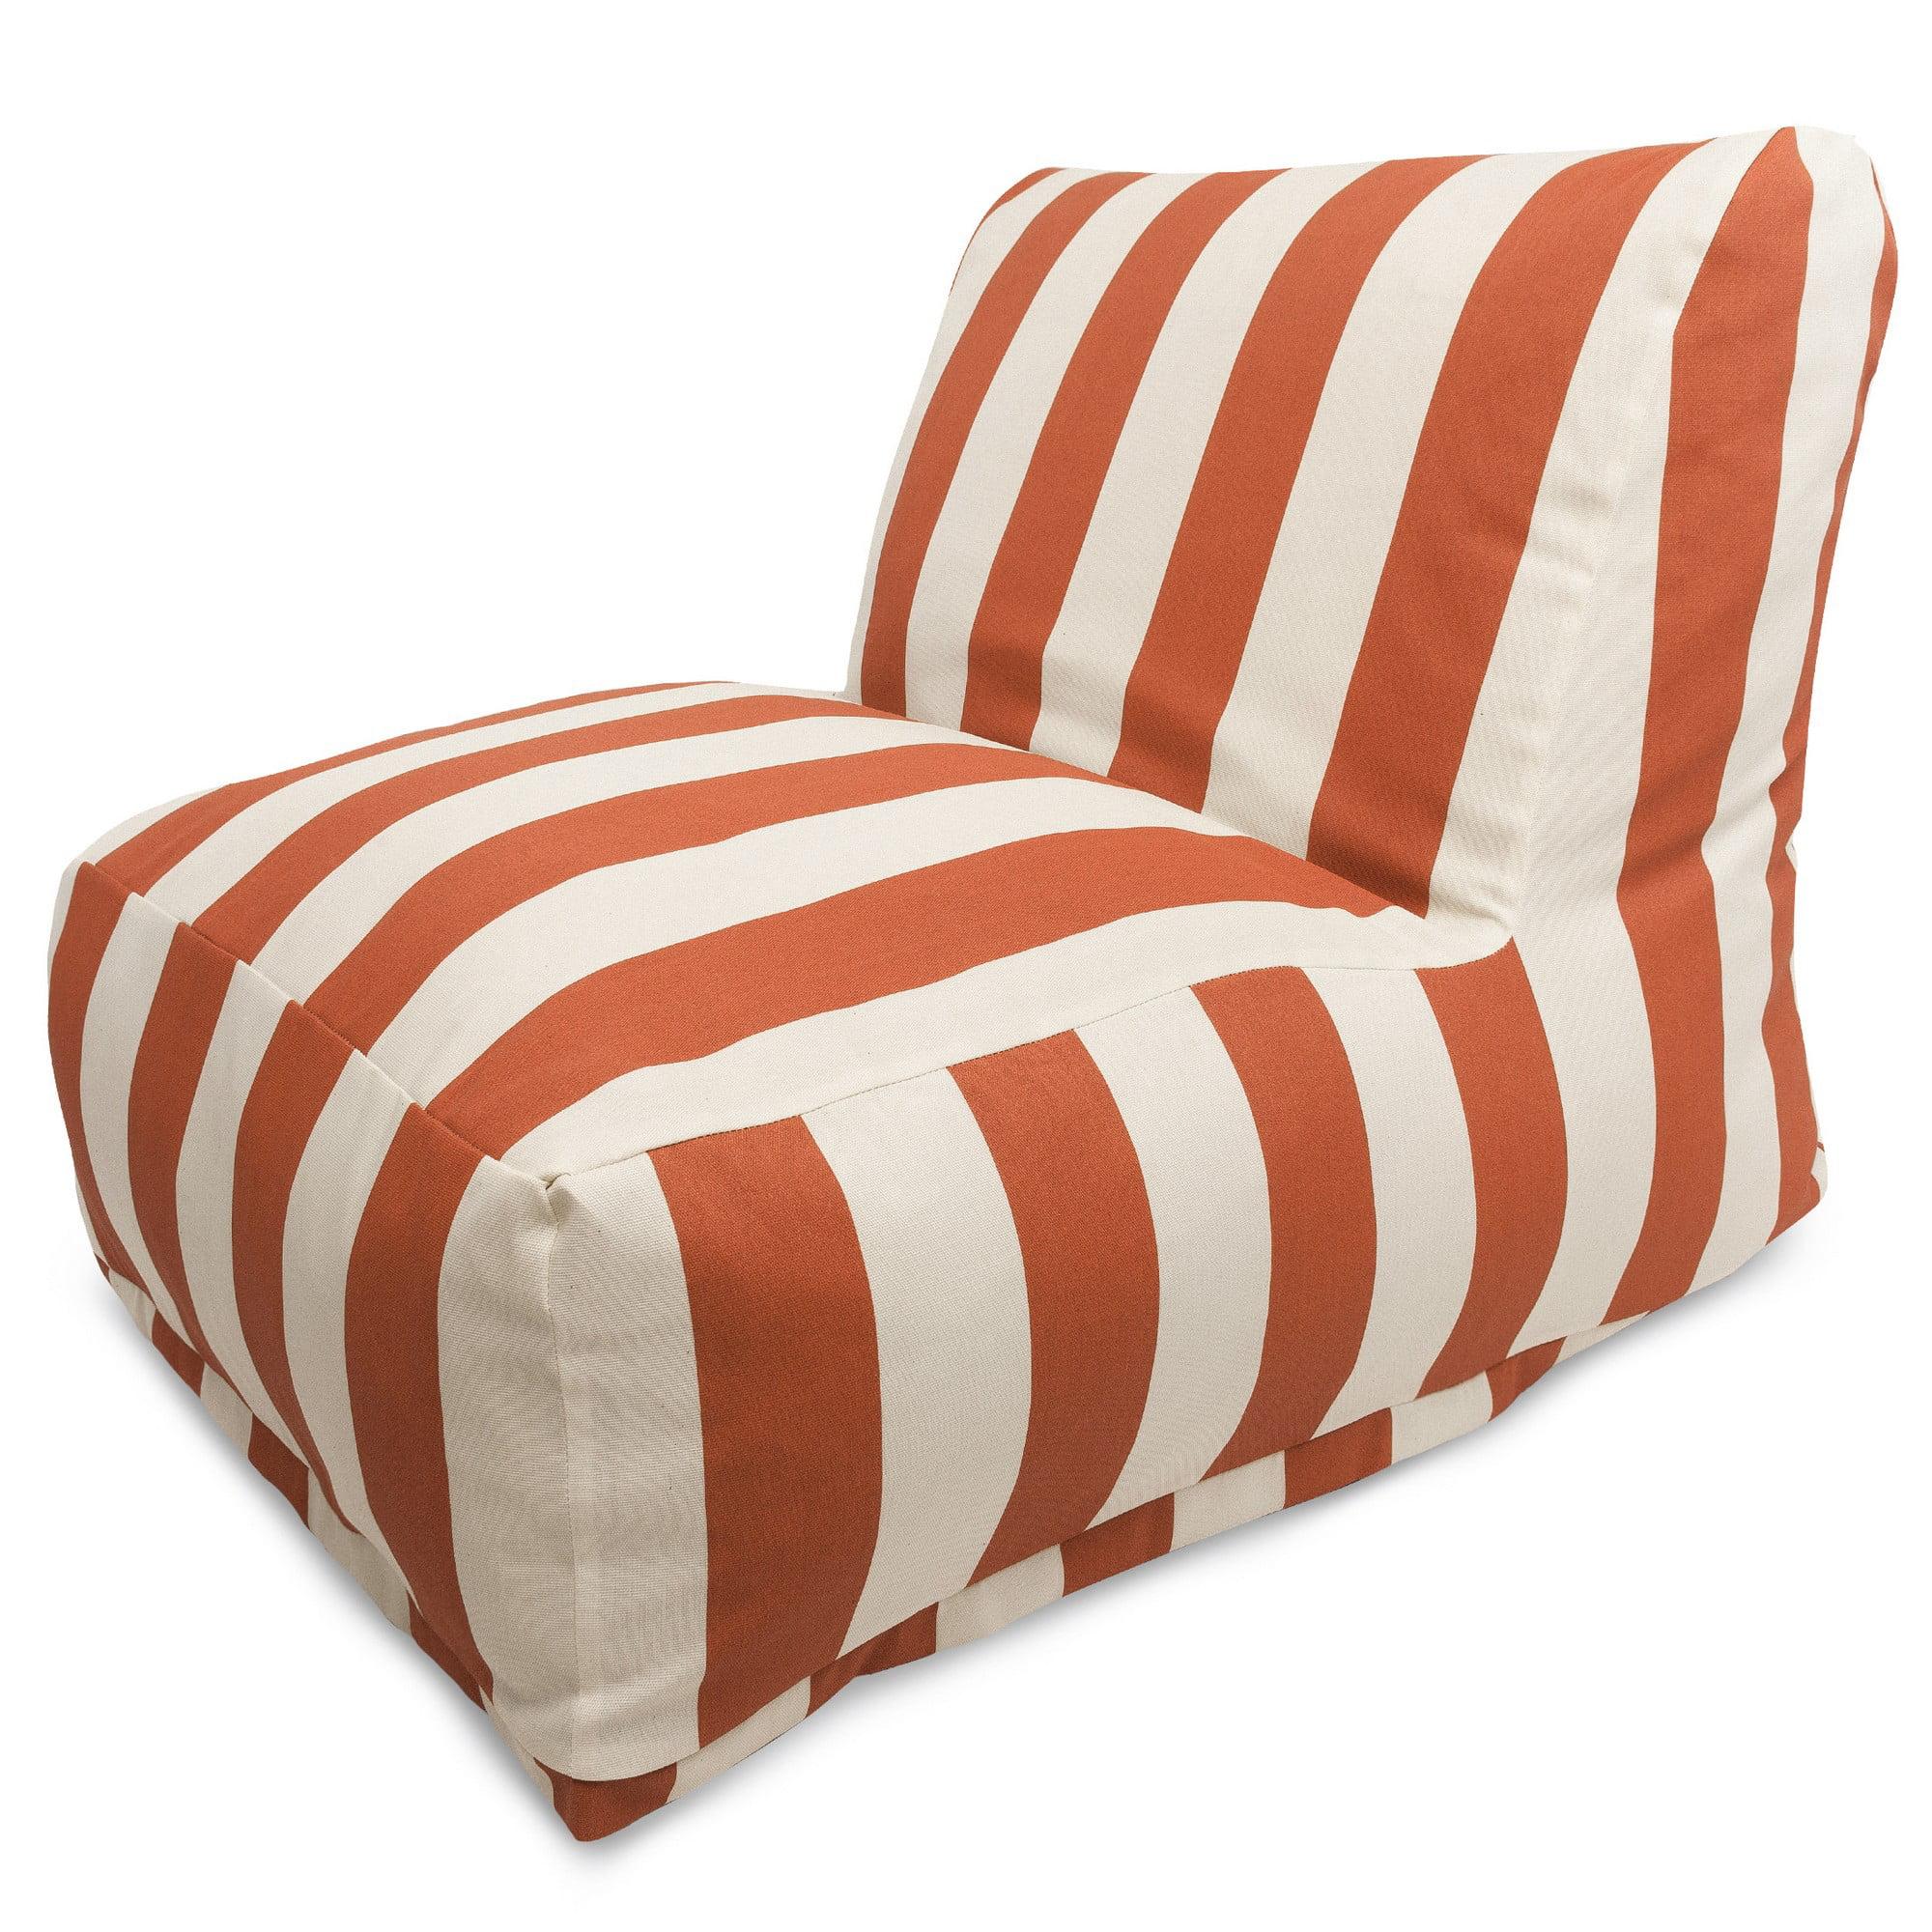 Majestic Home Goods Indoor Outdoor Burnt Orange Vertical Stripe Chair Lounger Bean Bag 36 in L x 27 in W x 24 in H